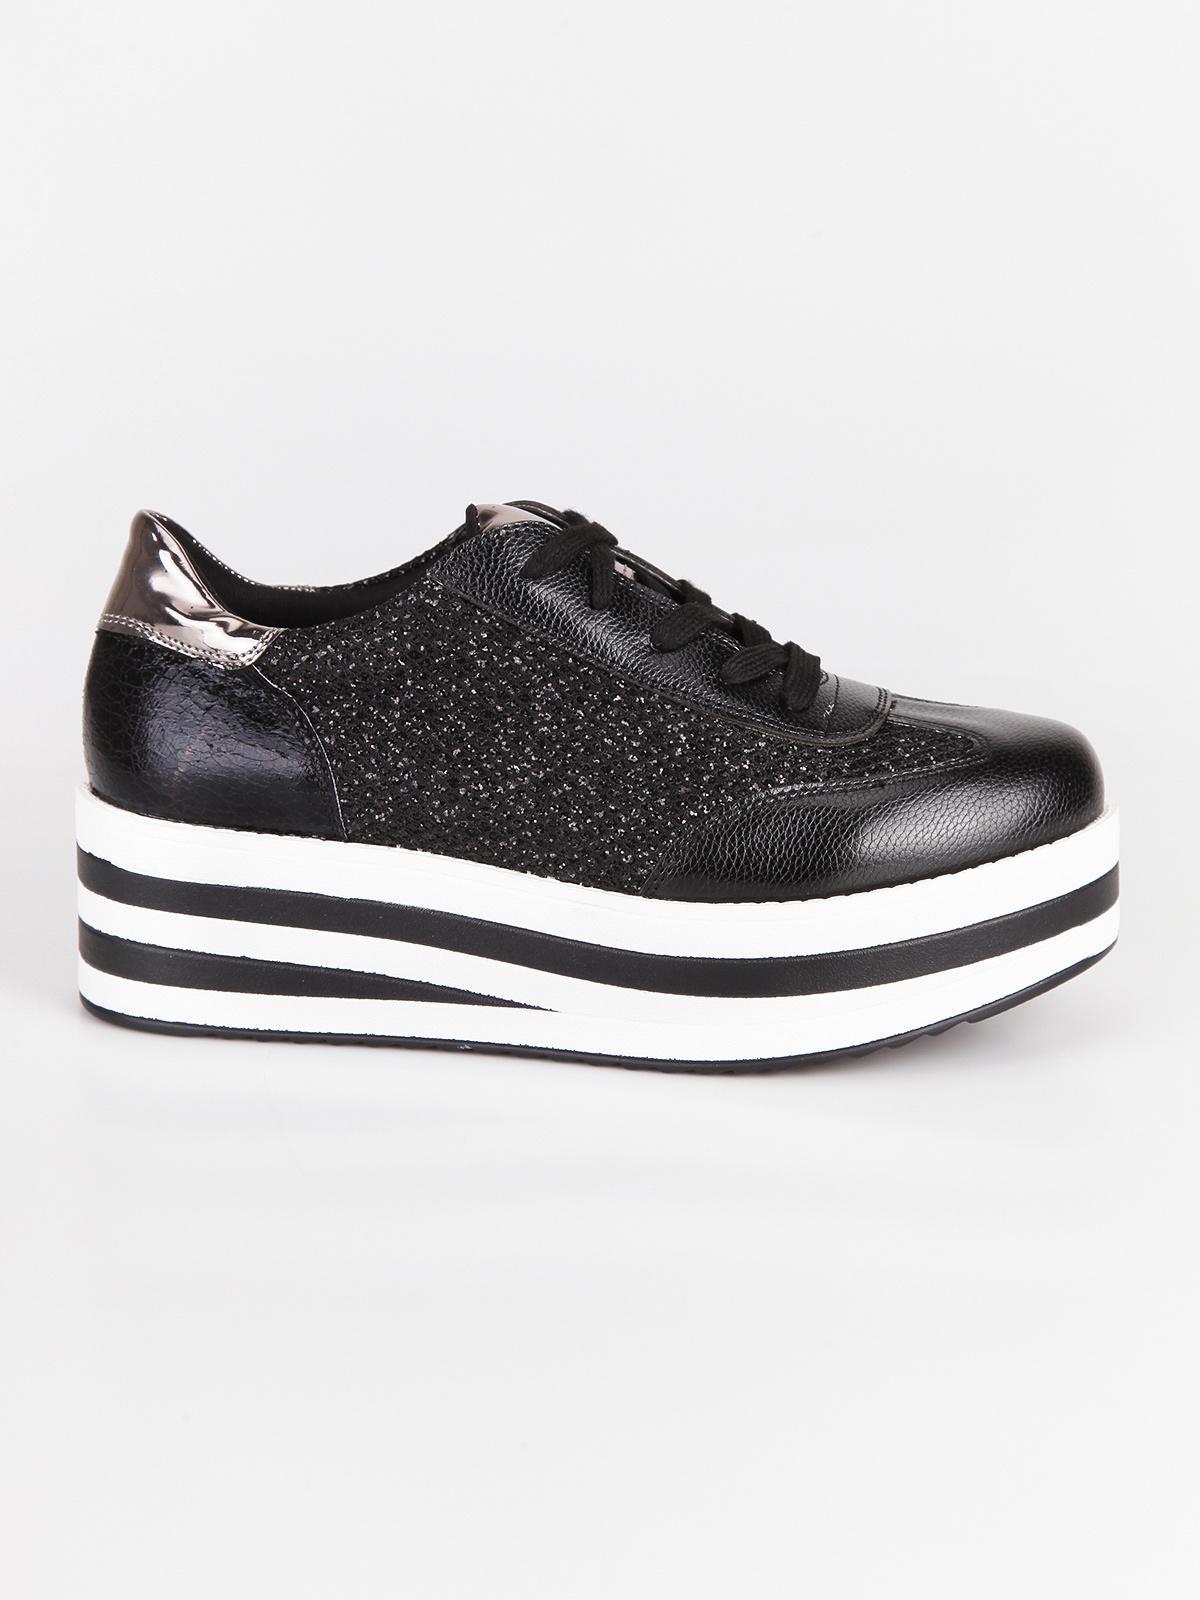 vari stili dopo bellezza Sneakers con platform alto e glitter lovery   MecShopping